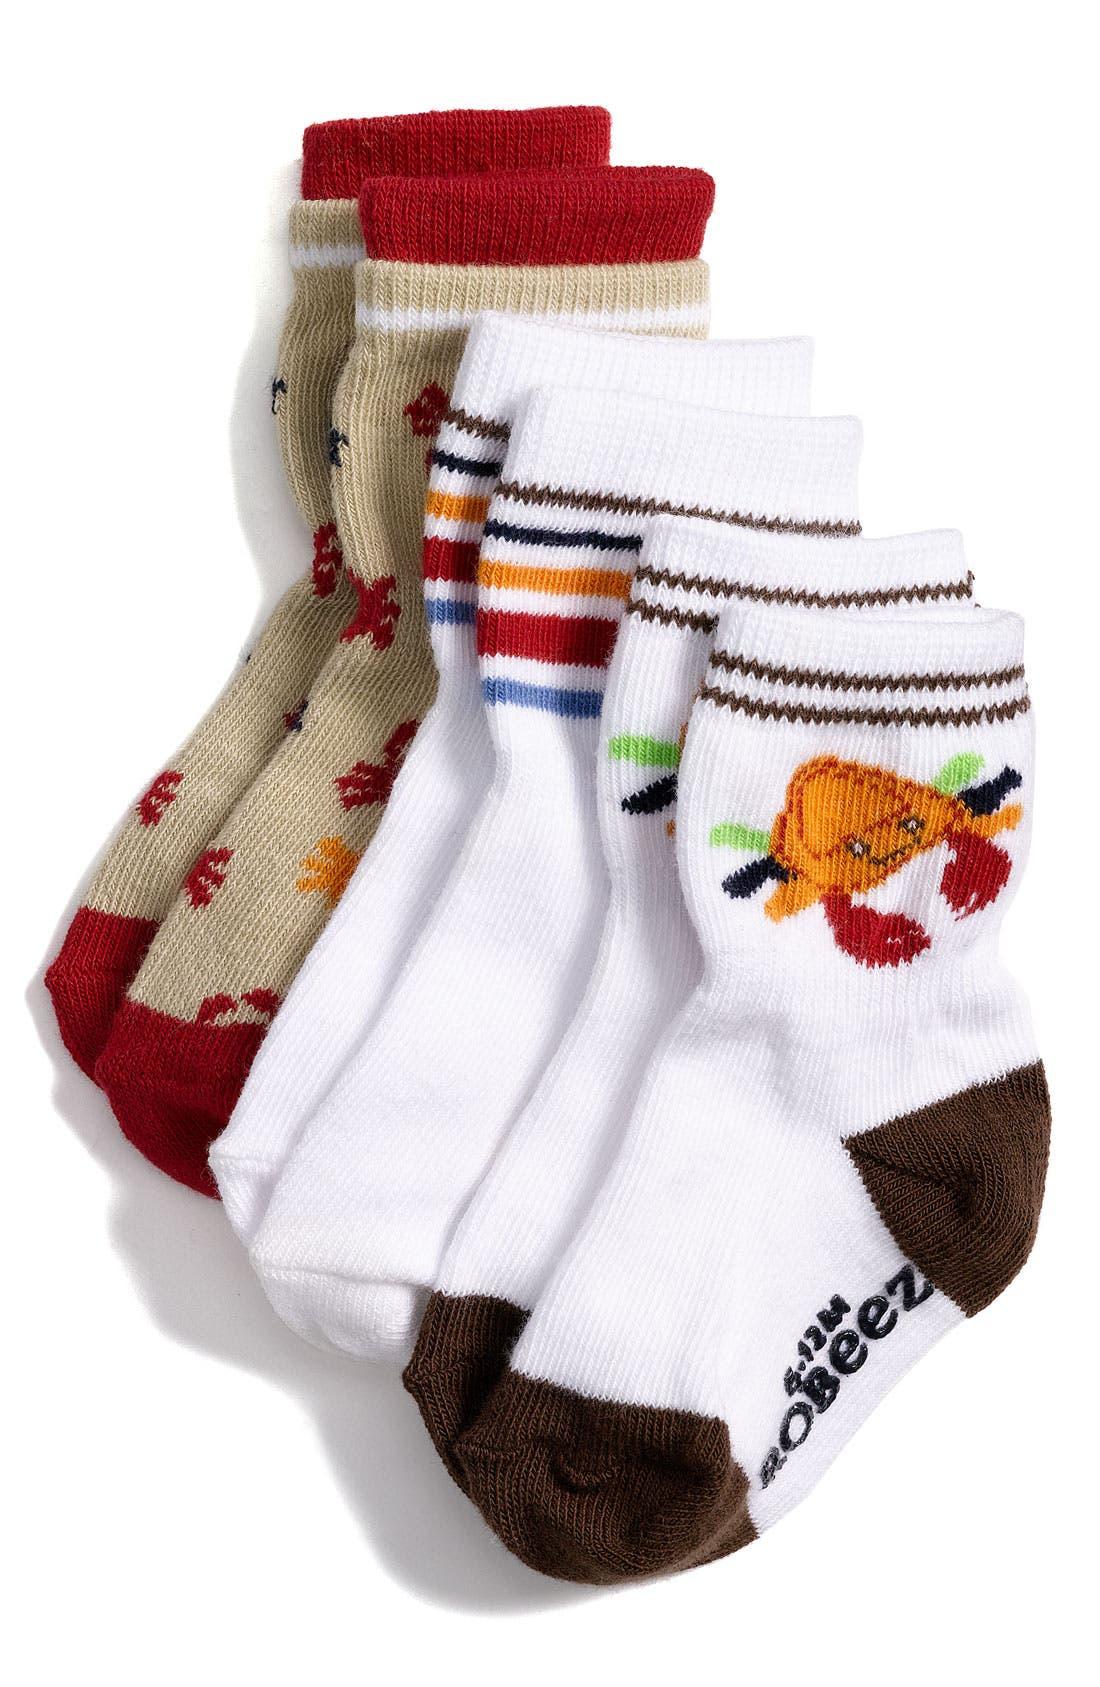 Main Image - Robeez® 'Crab' Socks (3-Pack) (Baby)